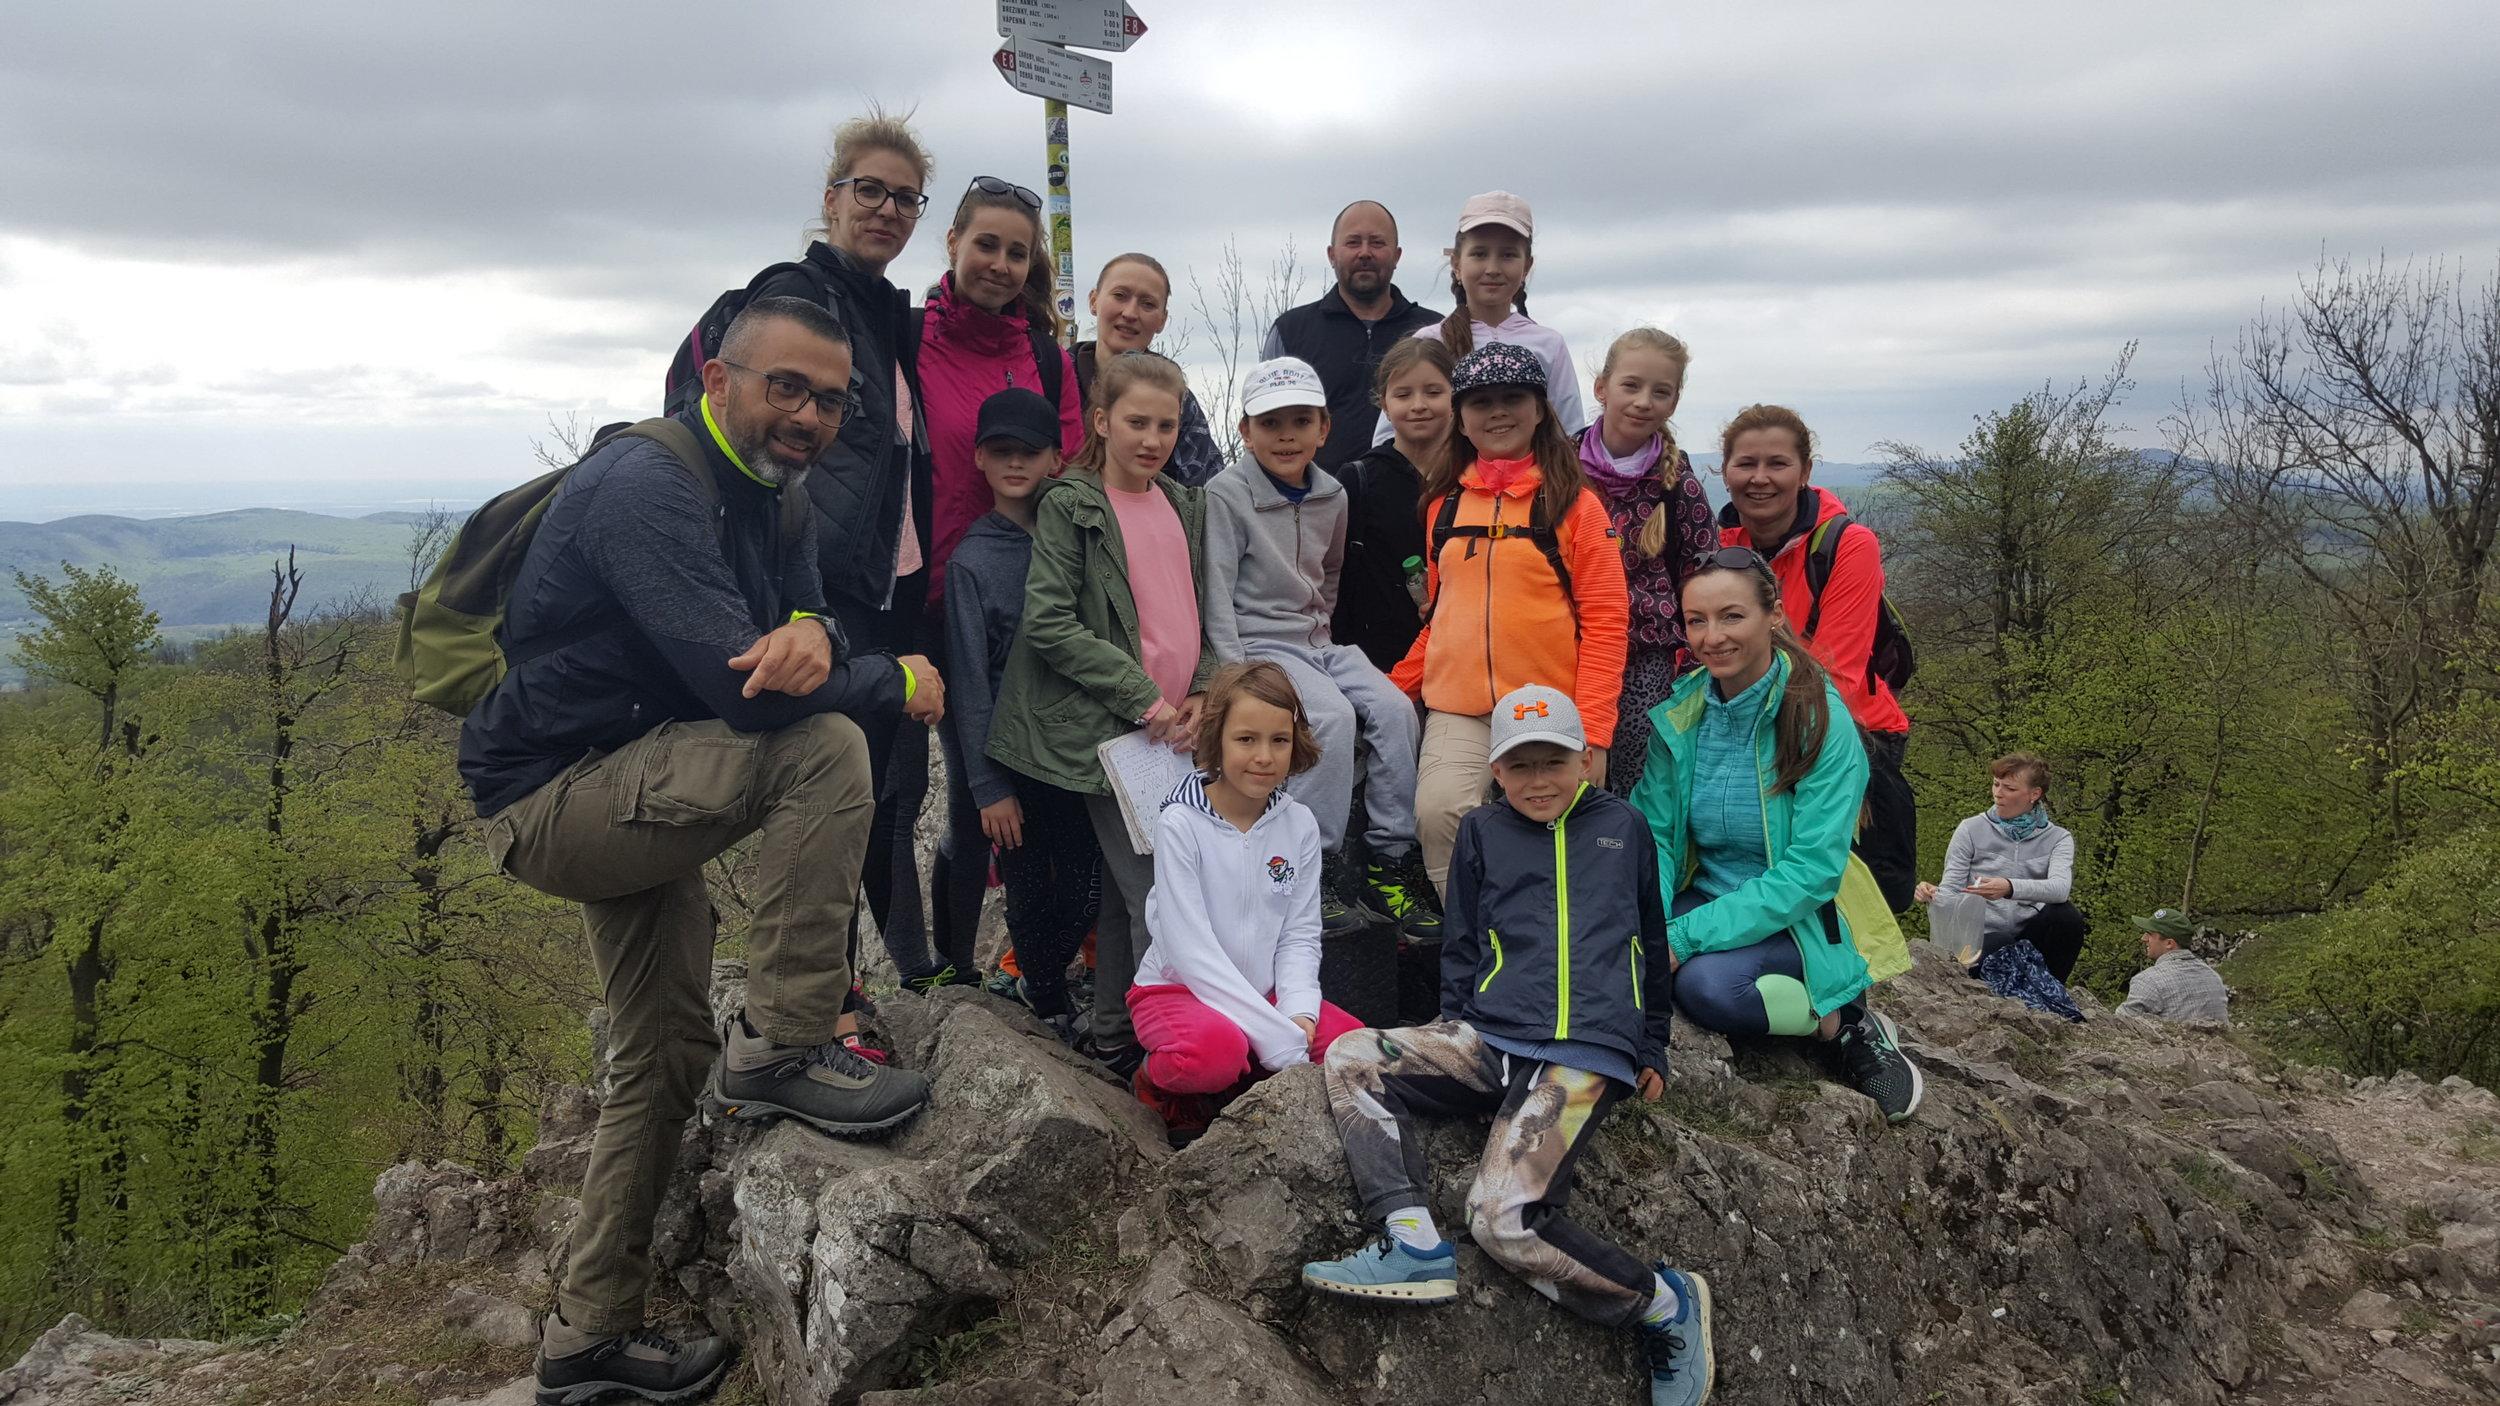 26.04.2019 - School Hike - Záruby